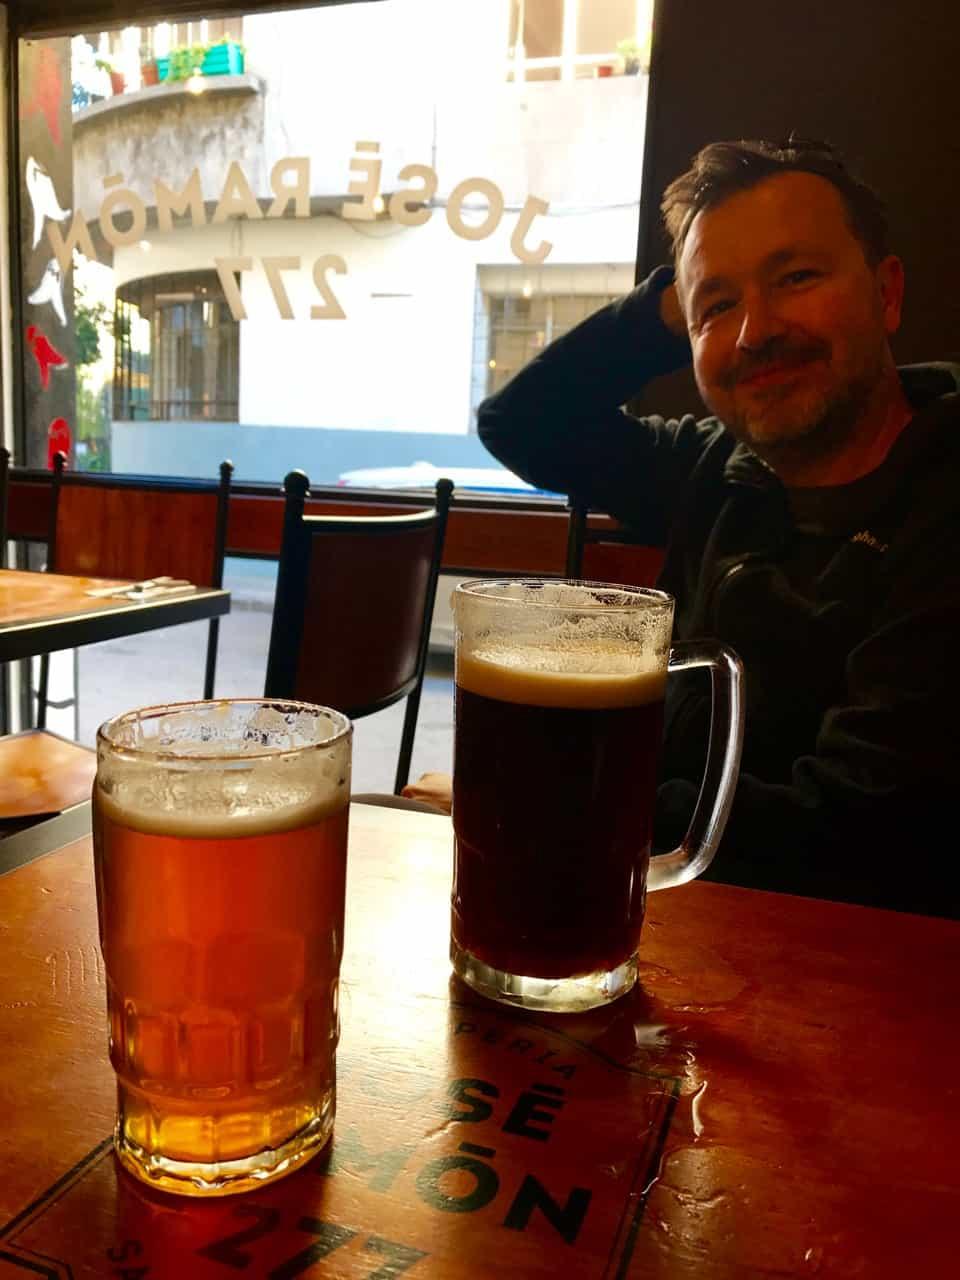 Things to do in Santiago - Drinking beer at José Ramón 277 in Santiago